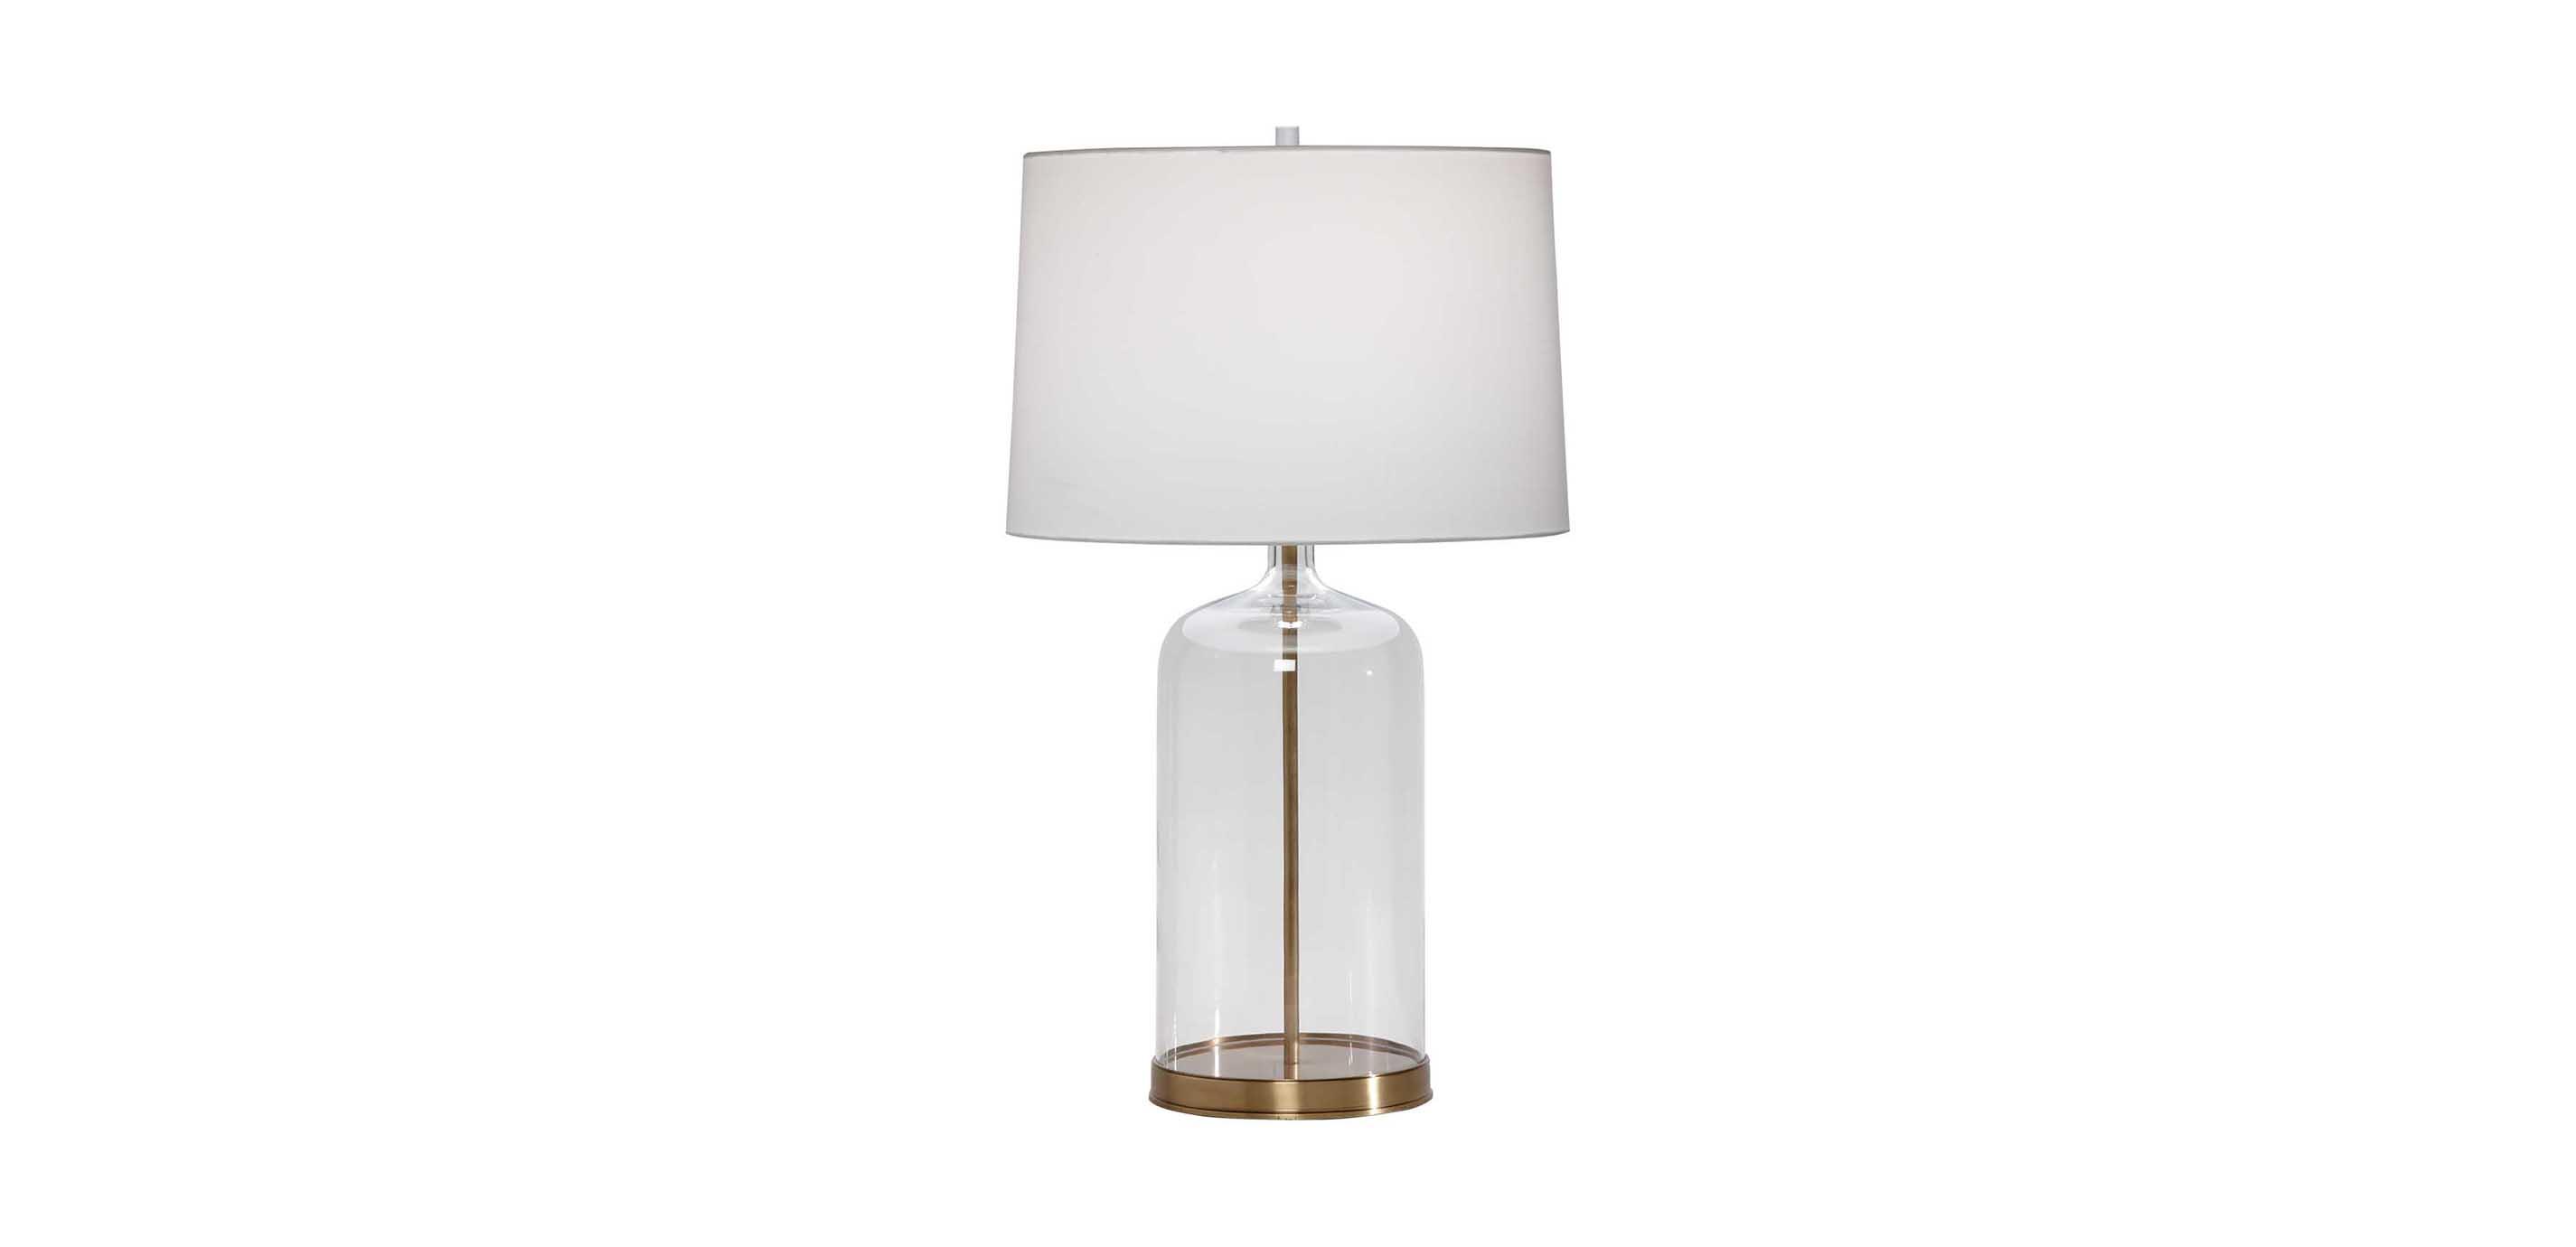 Kiera Table Lamp Table Lamps Ethan Allen